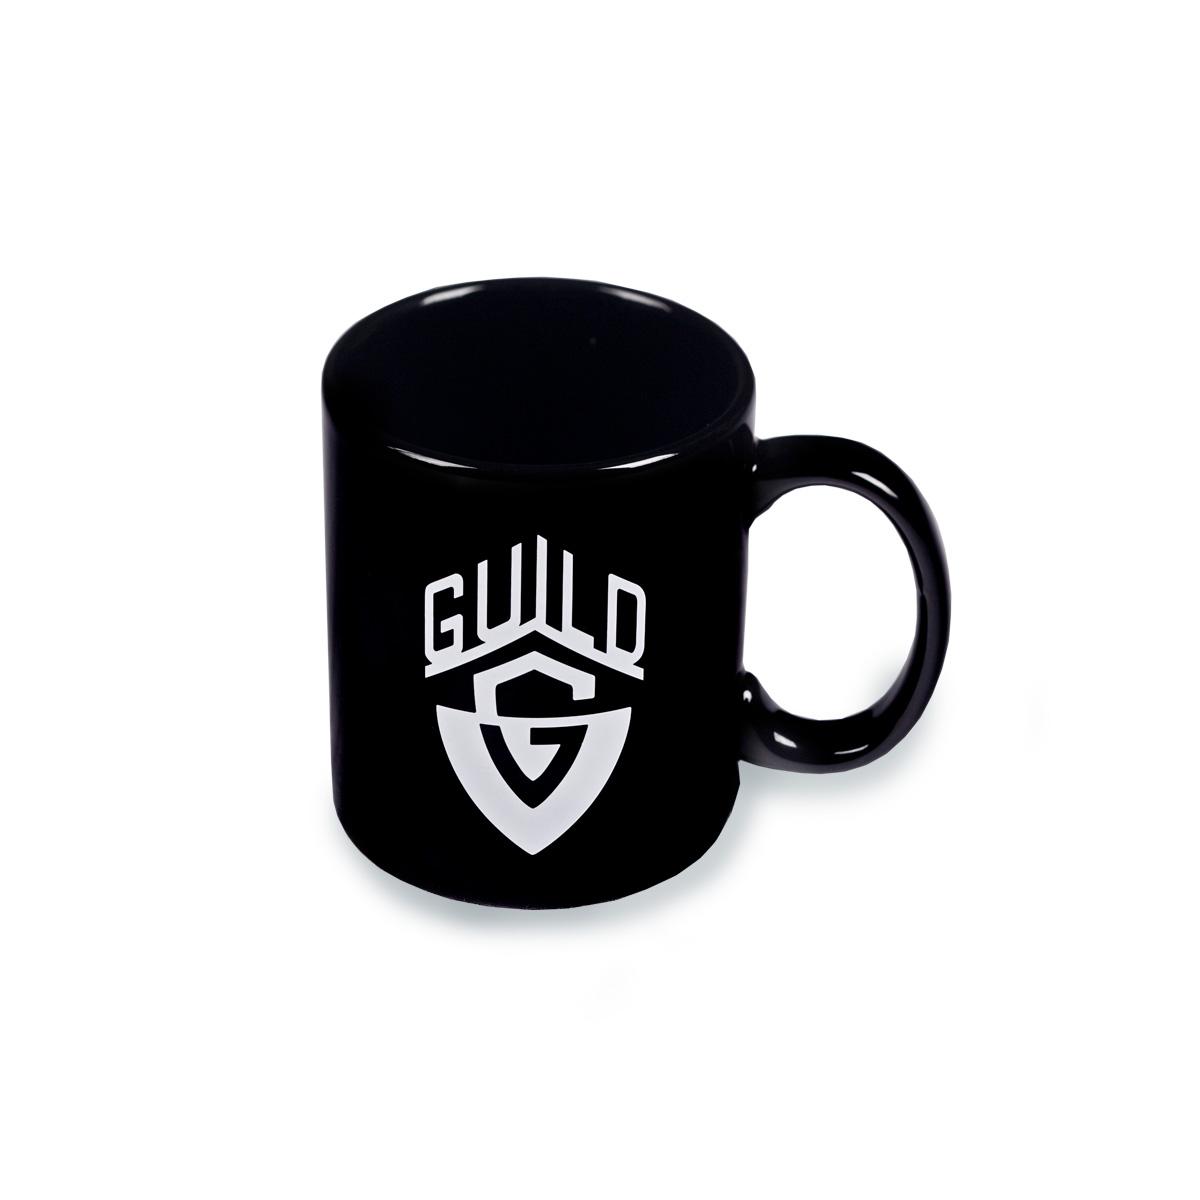 Guild Coffee Mug